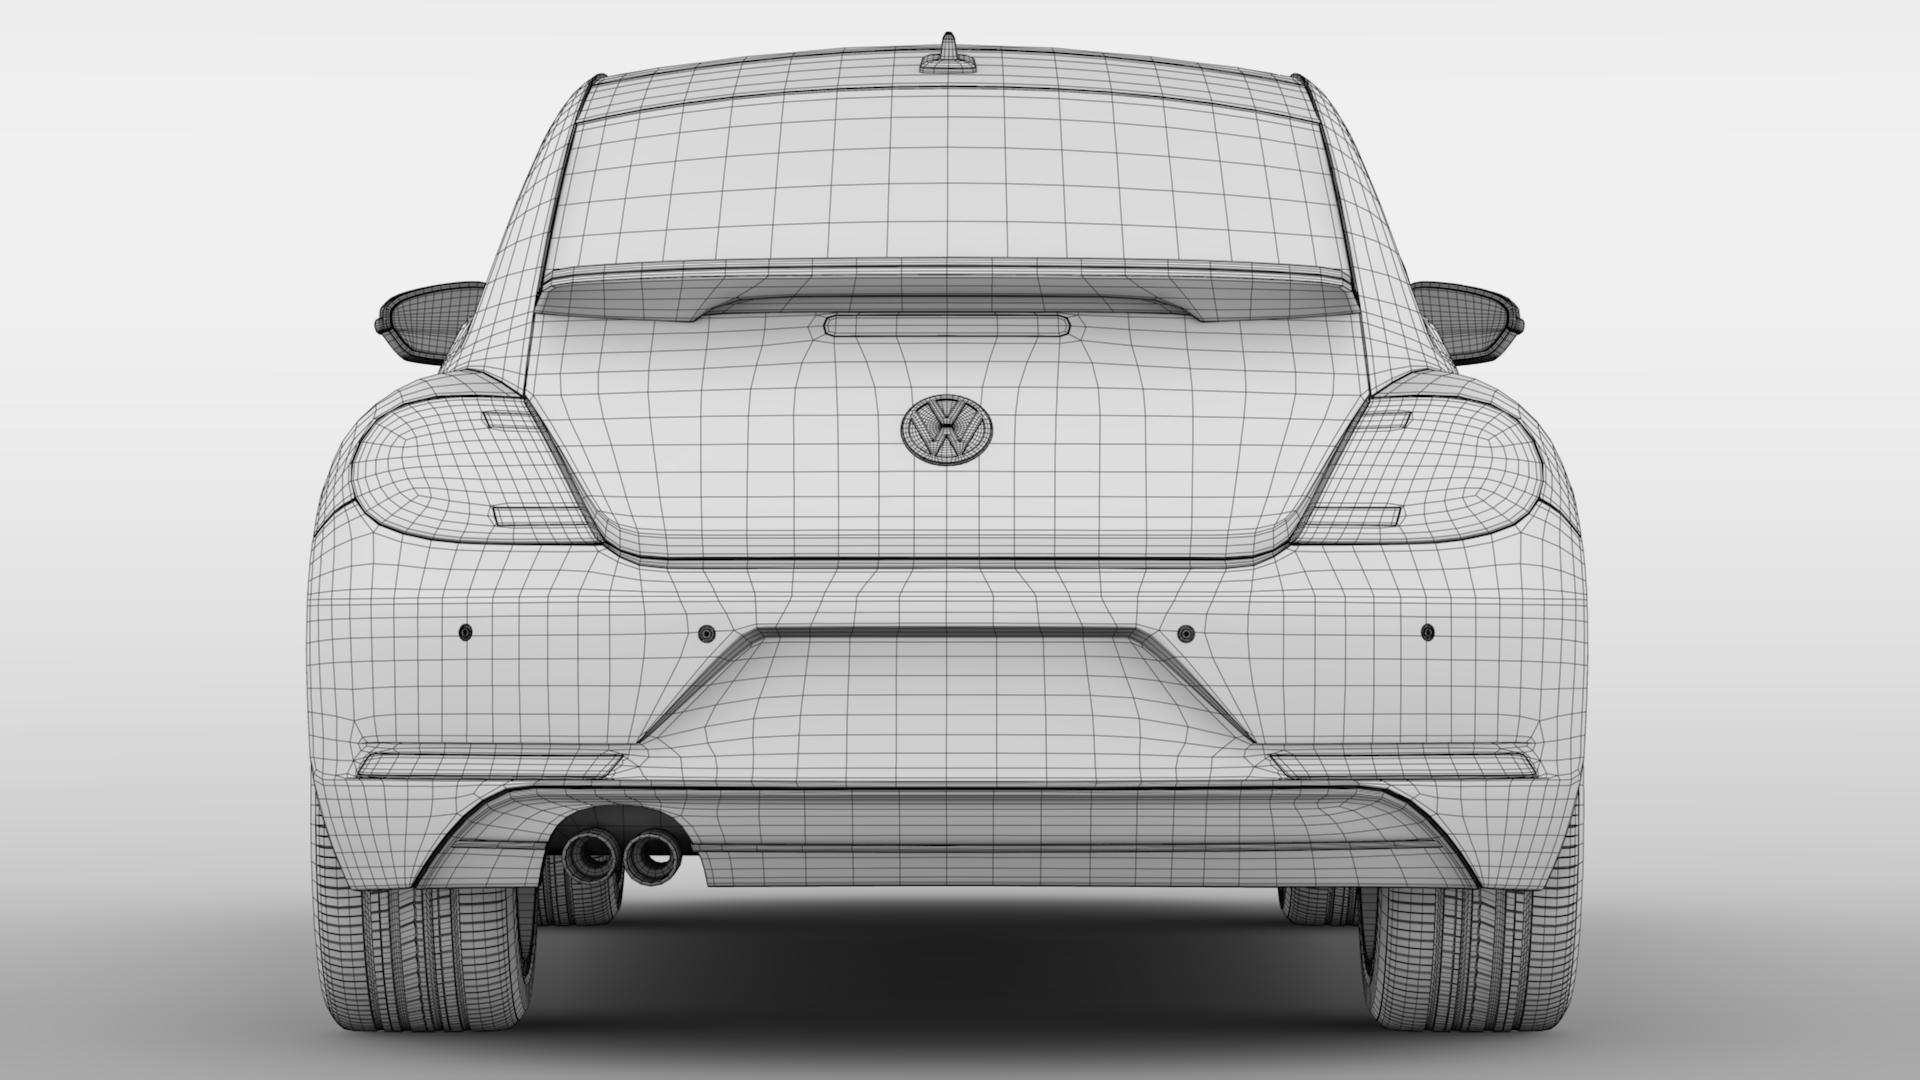 vw beetle 2017 3d model 3ds max fbx c4d lwo ma mb hrc xsi obj 221583